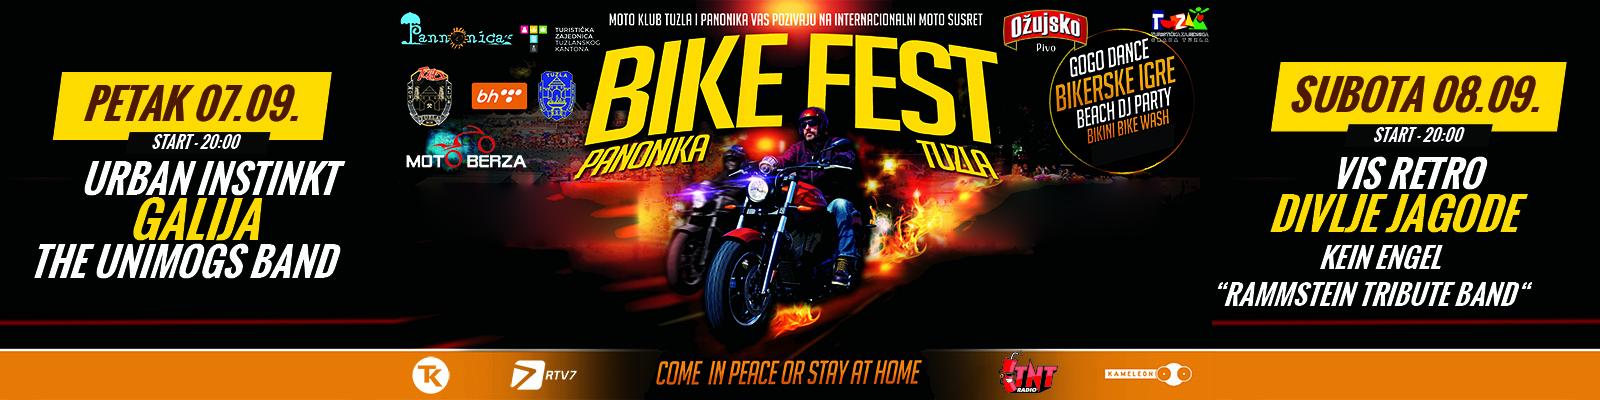 BikeFest2018_1600x400